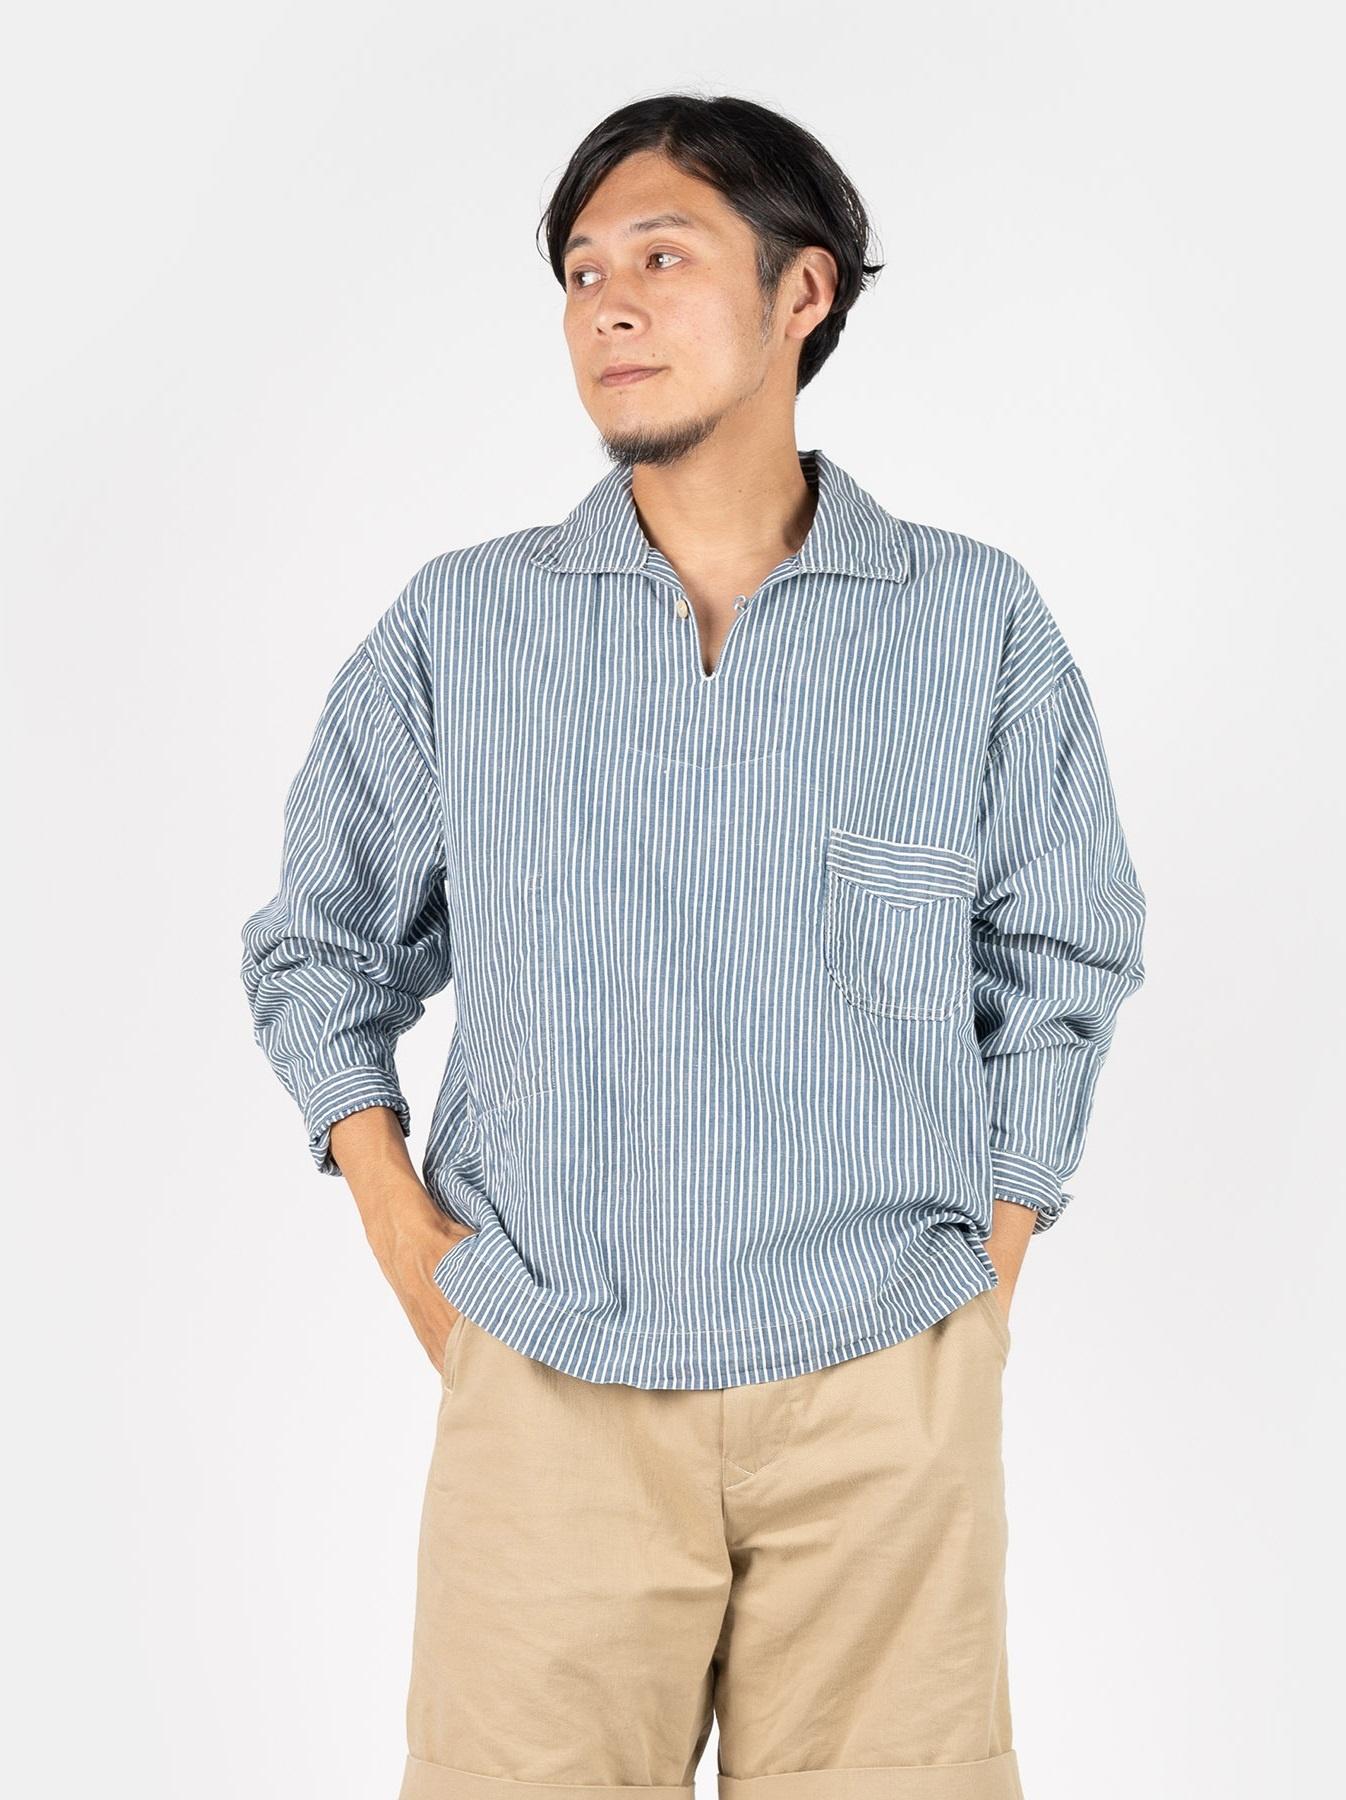 WH Cotton Linen Hickory Umahiko Pullover Shirt-3